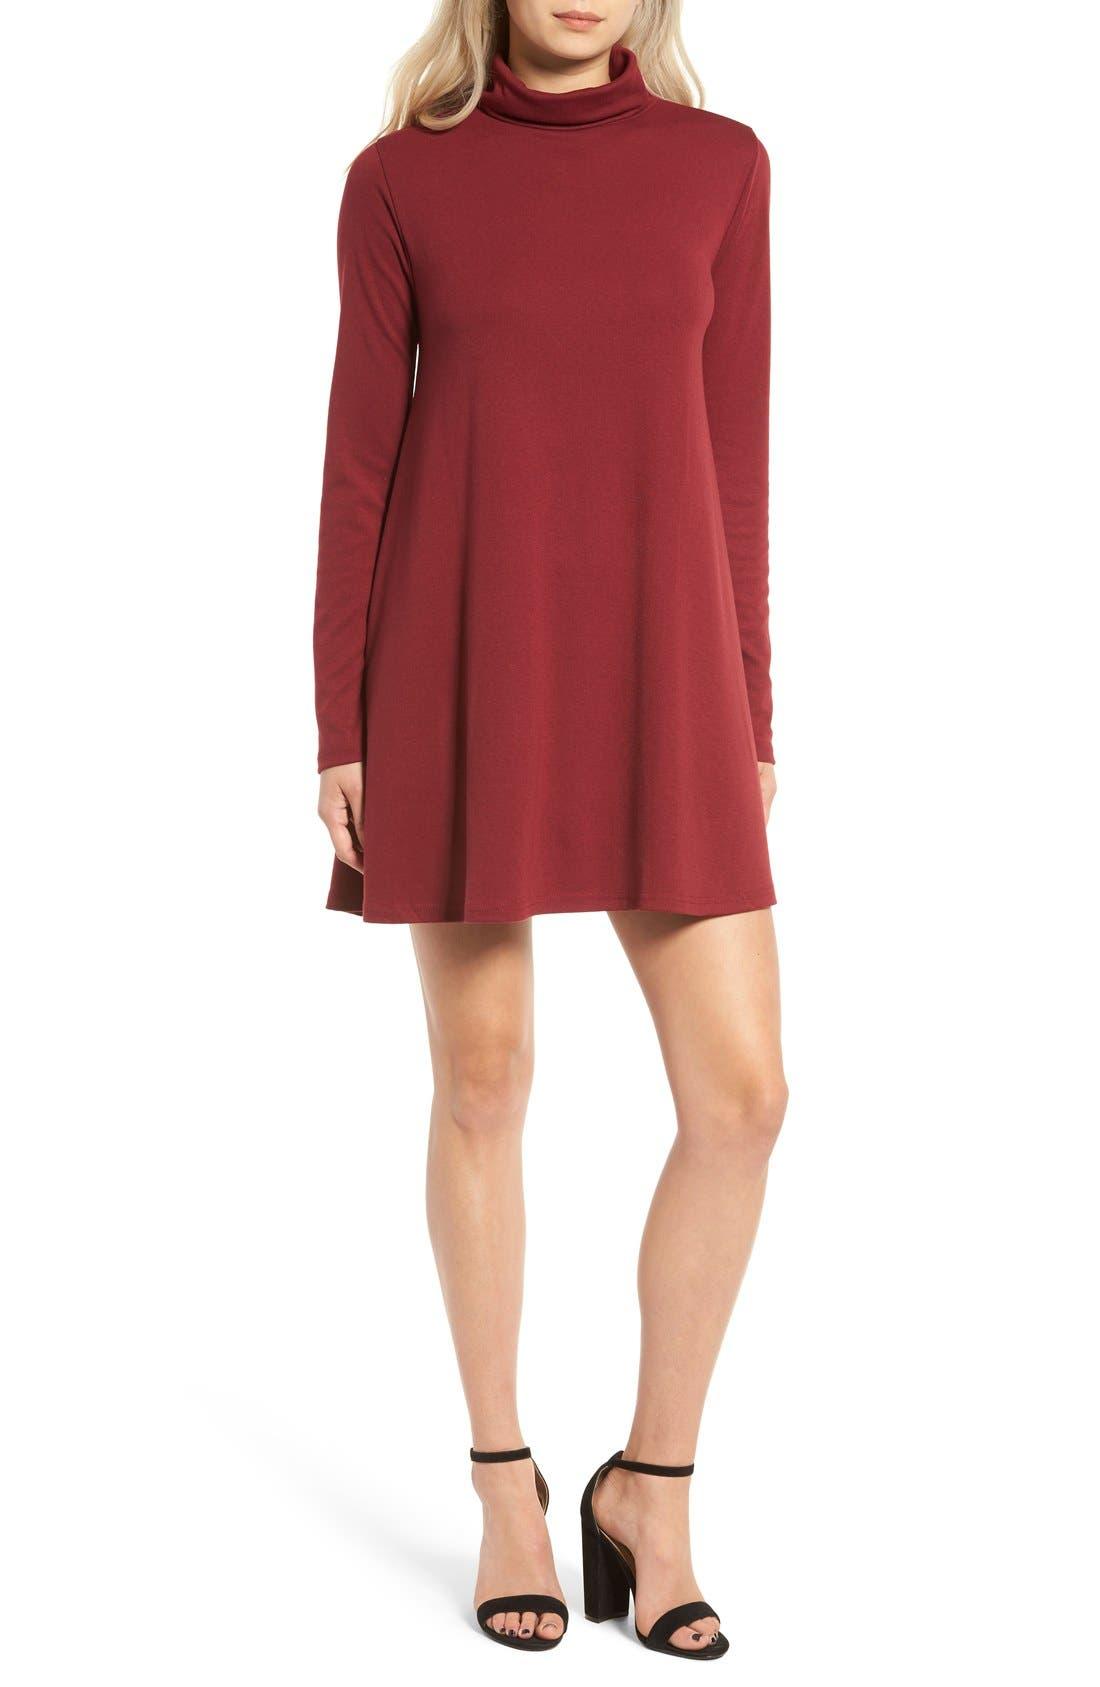 Alternate Image 1 Selected - Cotton Emporium Turtleneck Swing Dress